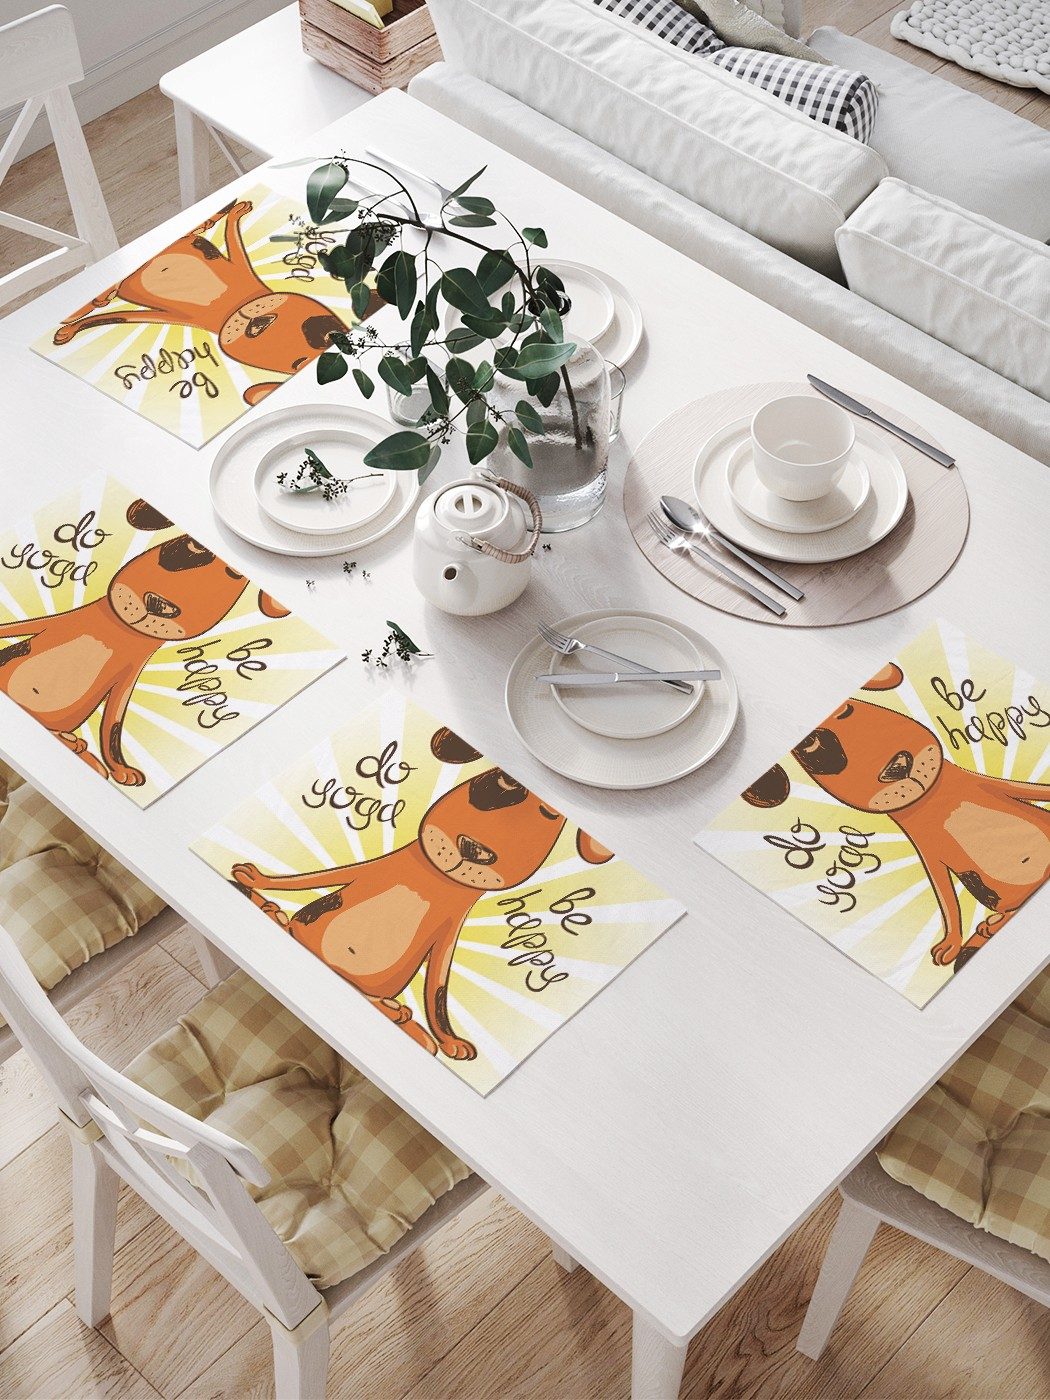 Комплект салфеток для сервировки стола «Собачья йога» (32х46 см, 4 шт.)